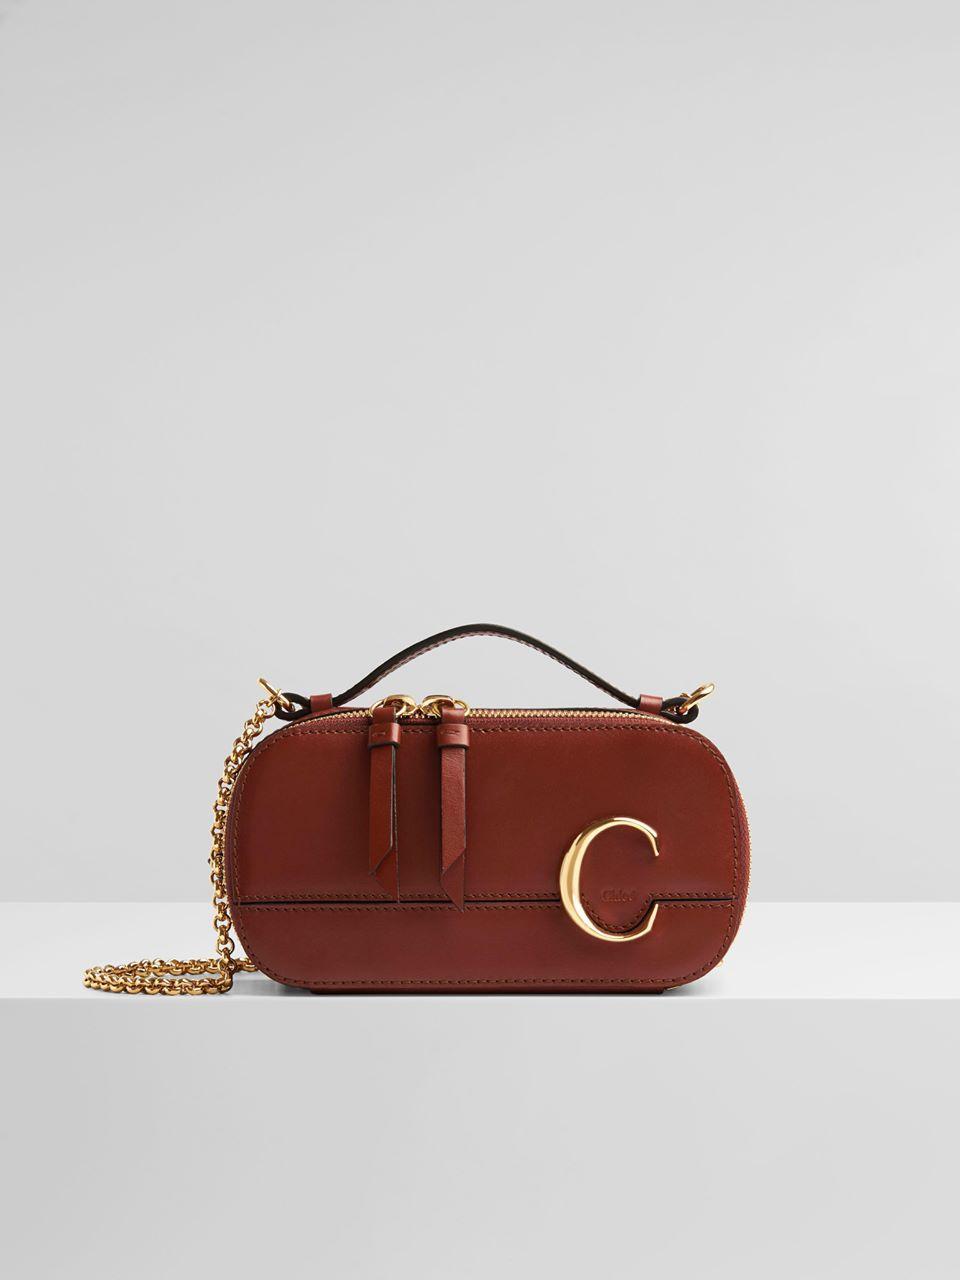 CHLOÉ Chloé C mini vanity bag Women's Sepia Brown 100% Calf-skin leather